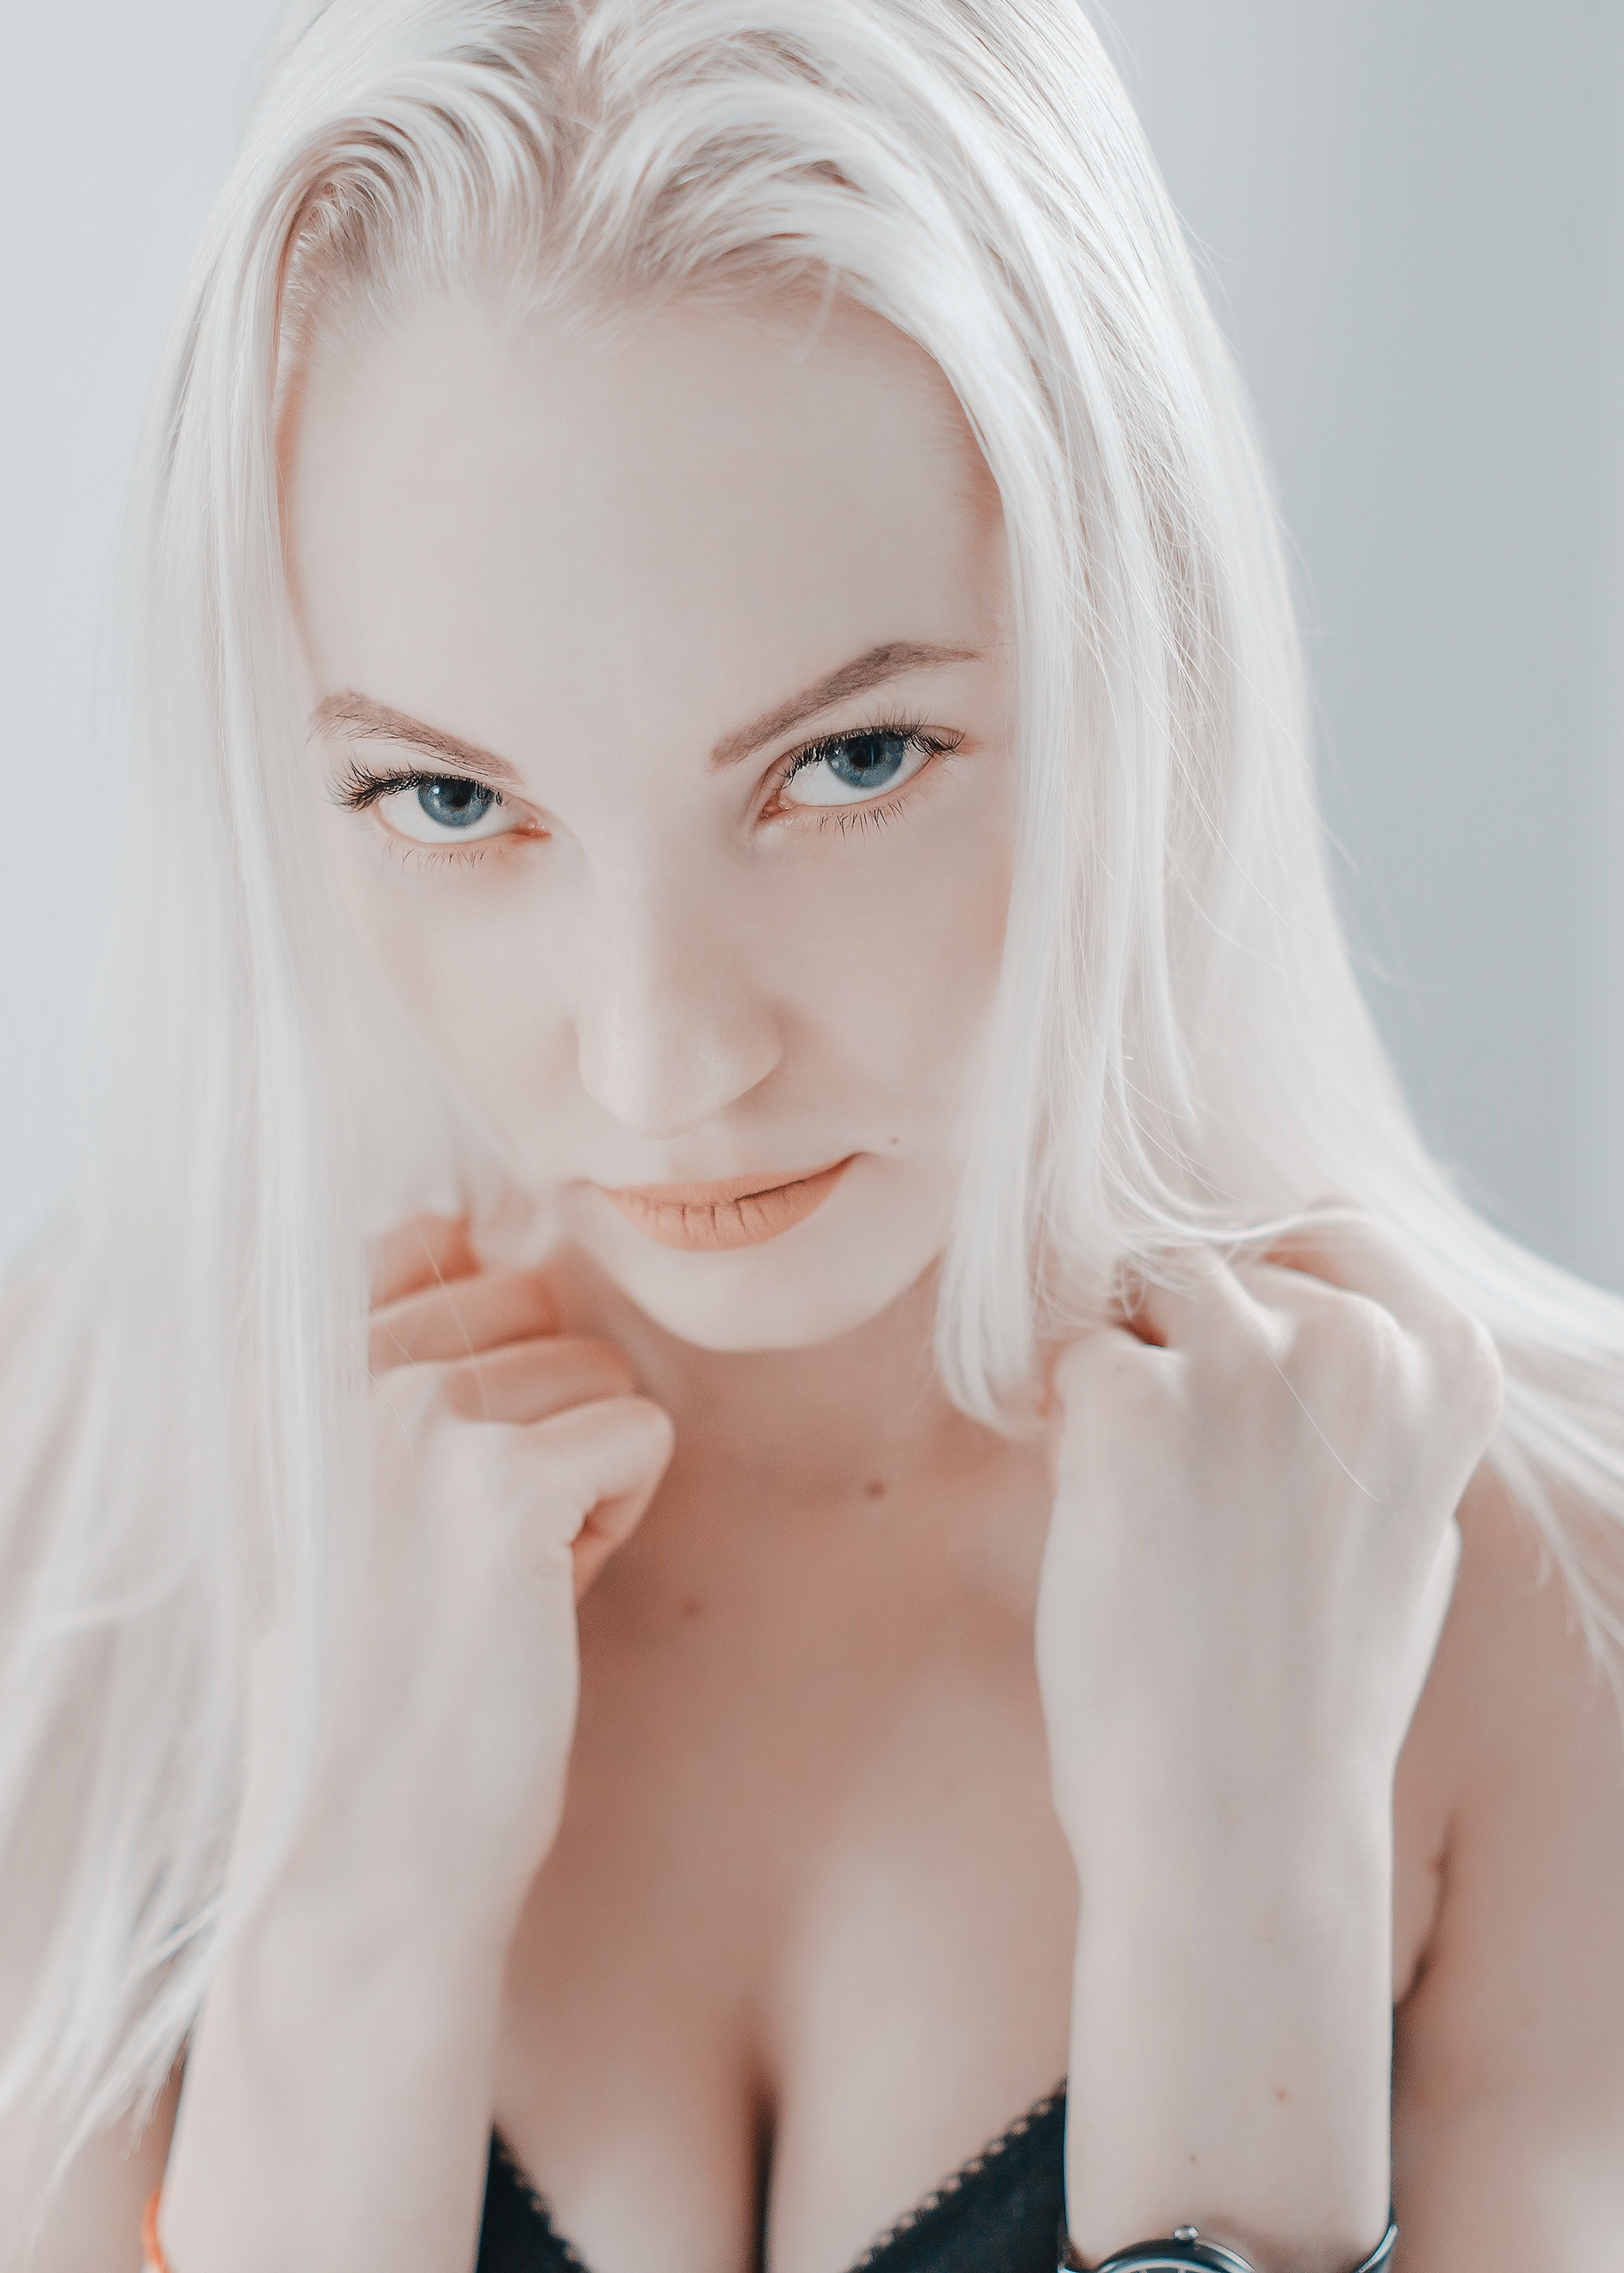 Porcelain girl - photography, women - ans42 | ello